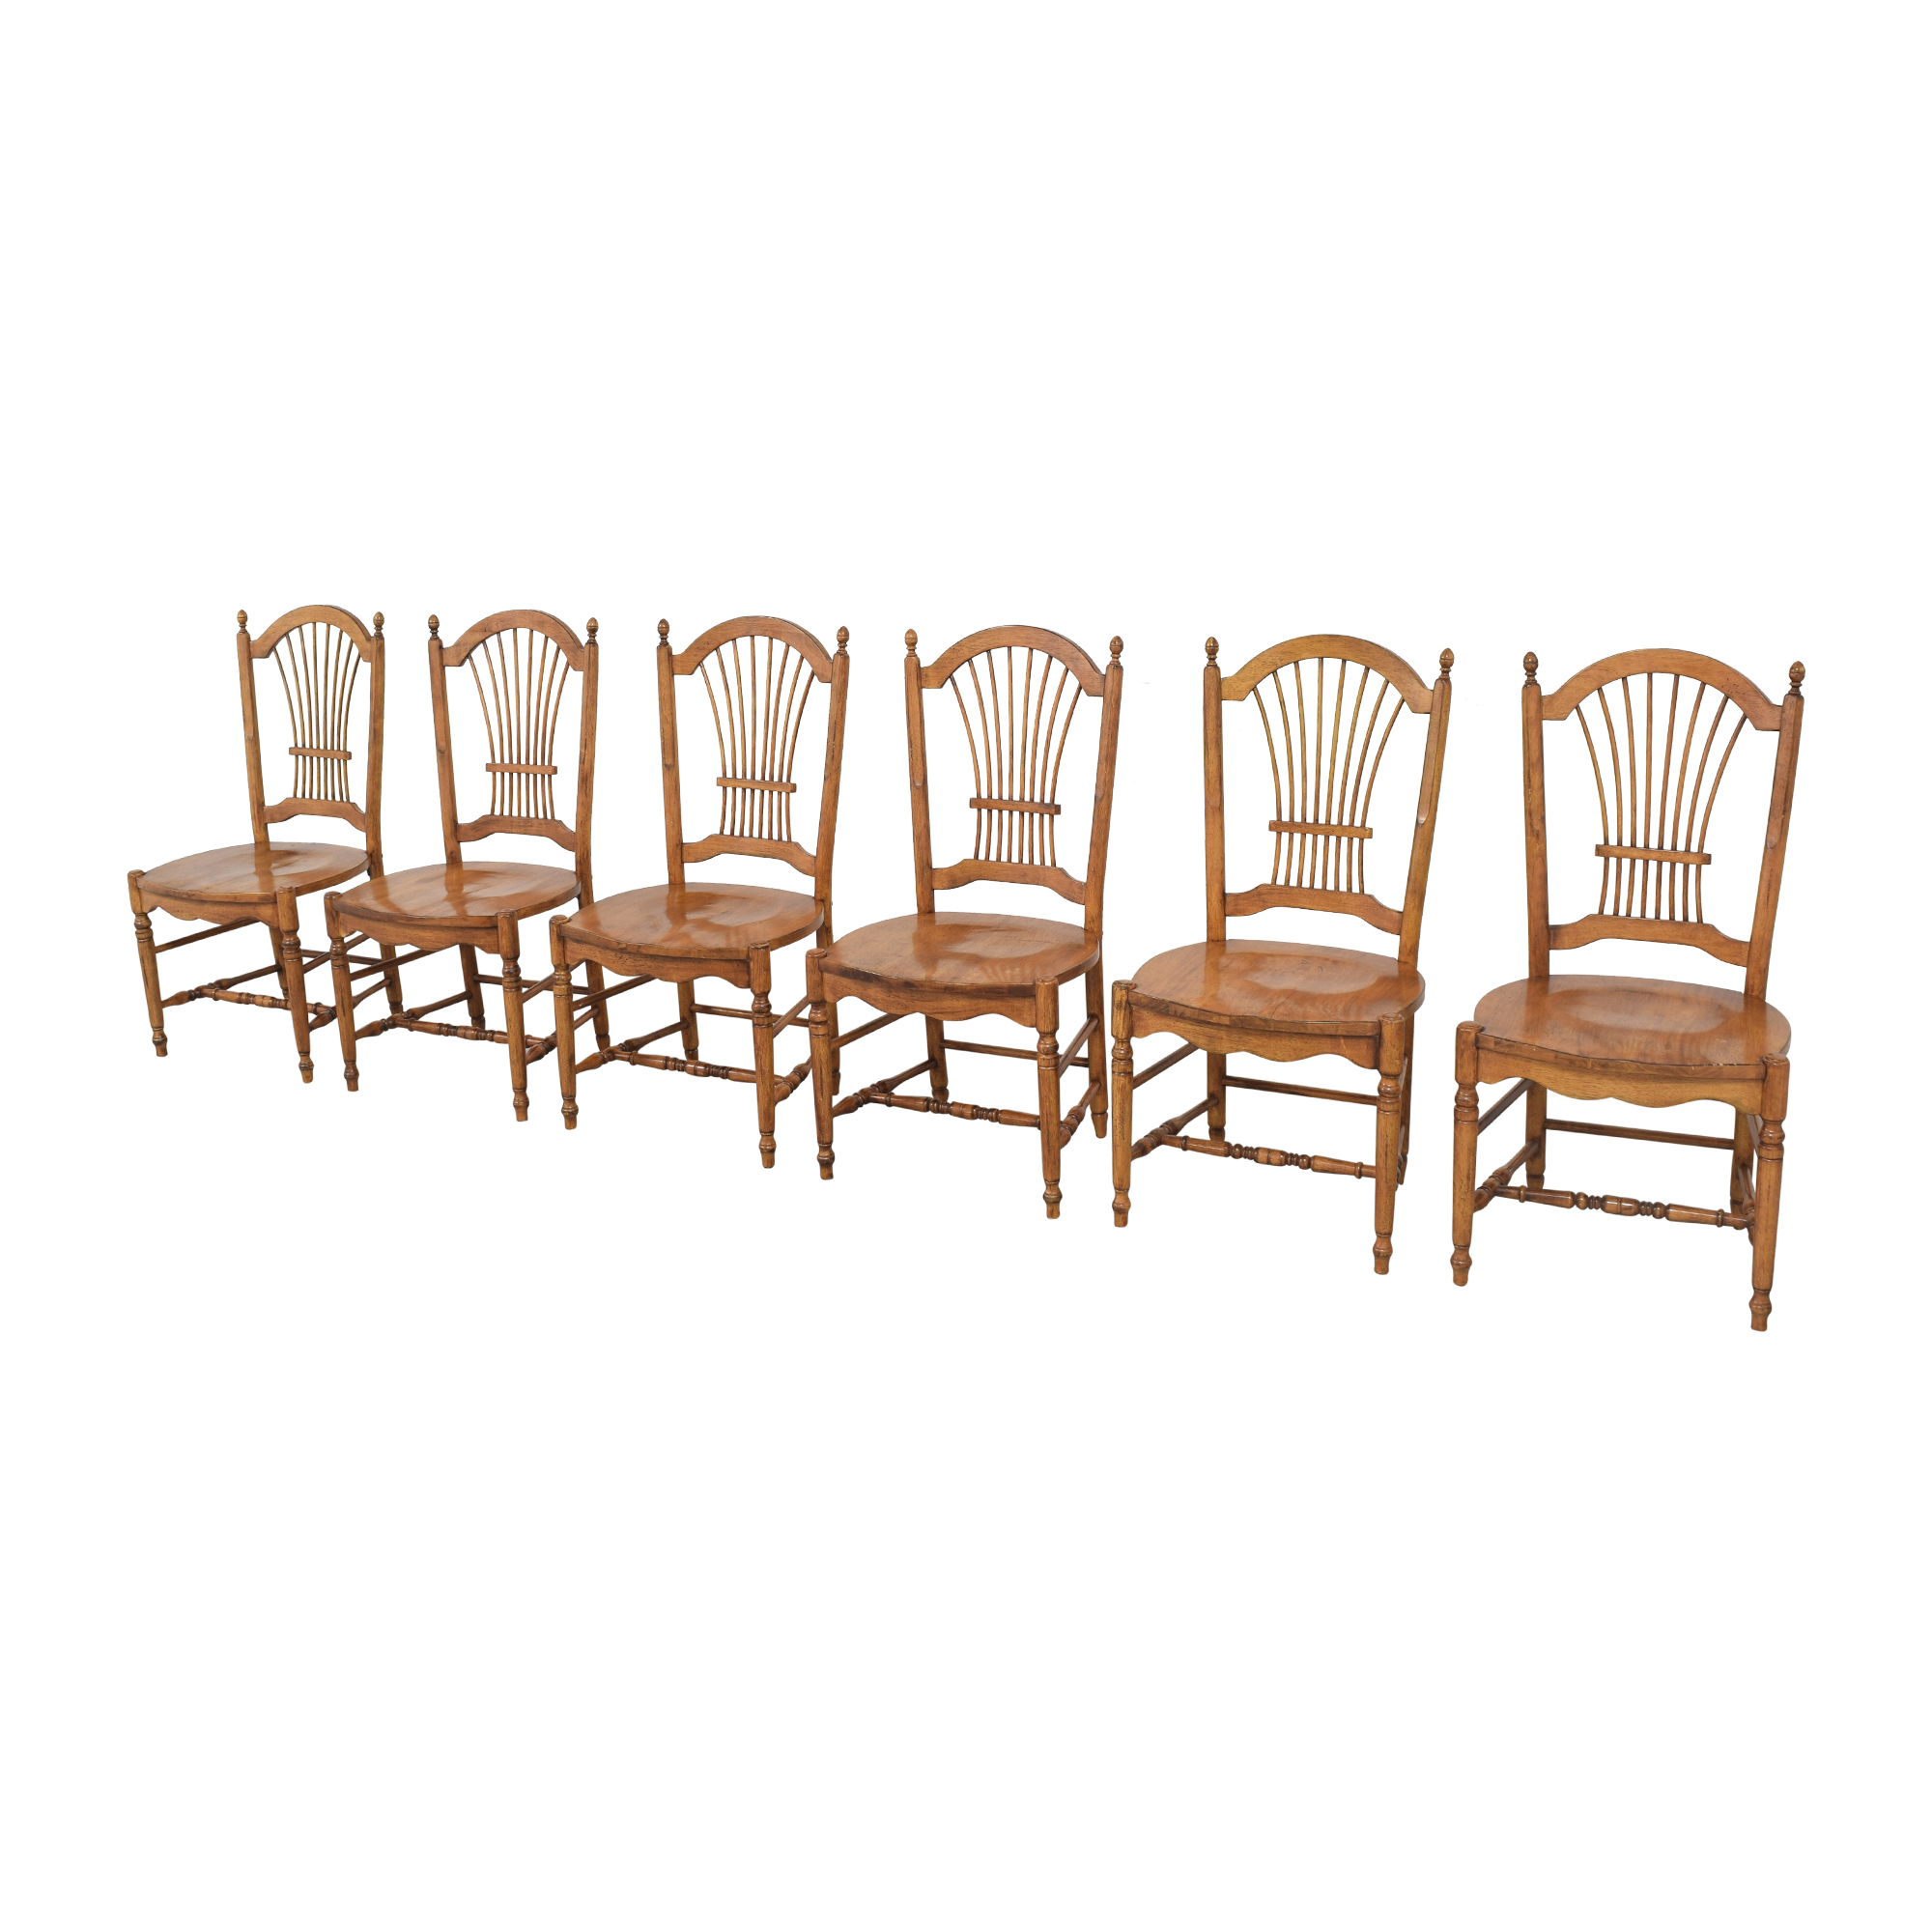 Drexel Drexel Sheaf Back Dining Chairs brown